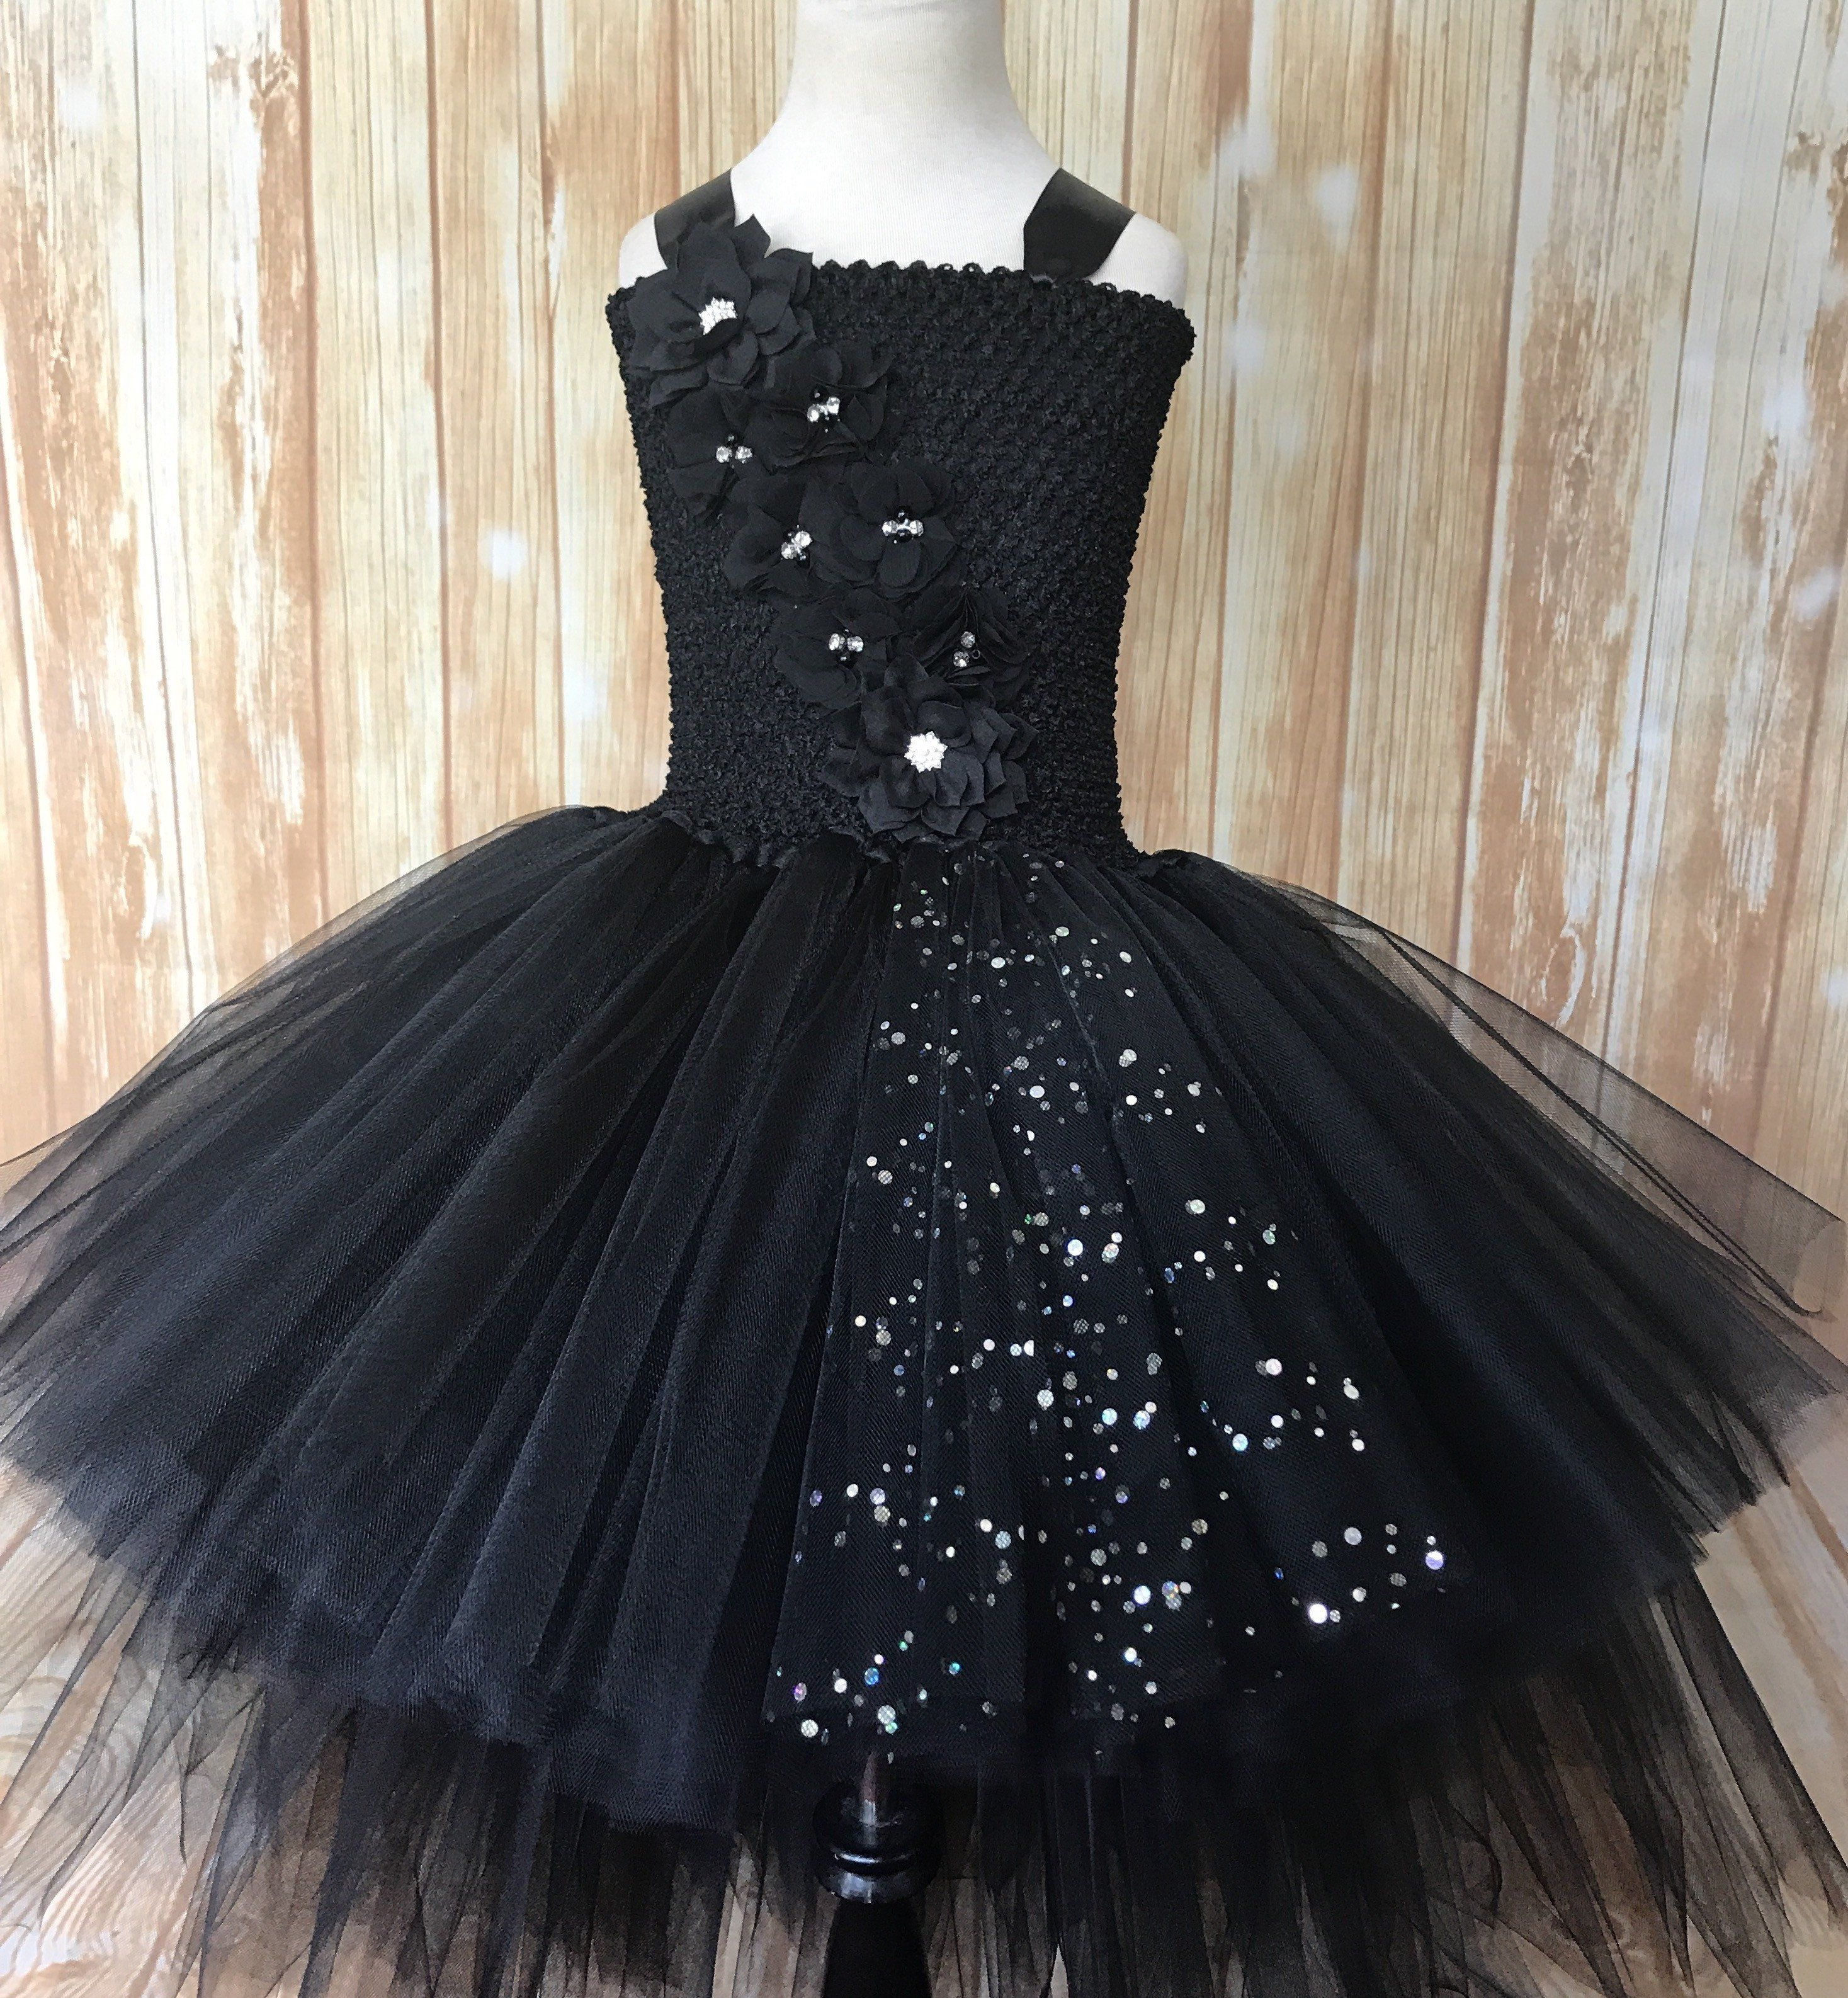 Black Dress-Black Fancy Tutu Dress-Black Flower Girl Tutu Dress-Black Girls Dress-Black Tutu Dress-Black Wedding Dress-Black Baby Dress